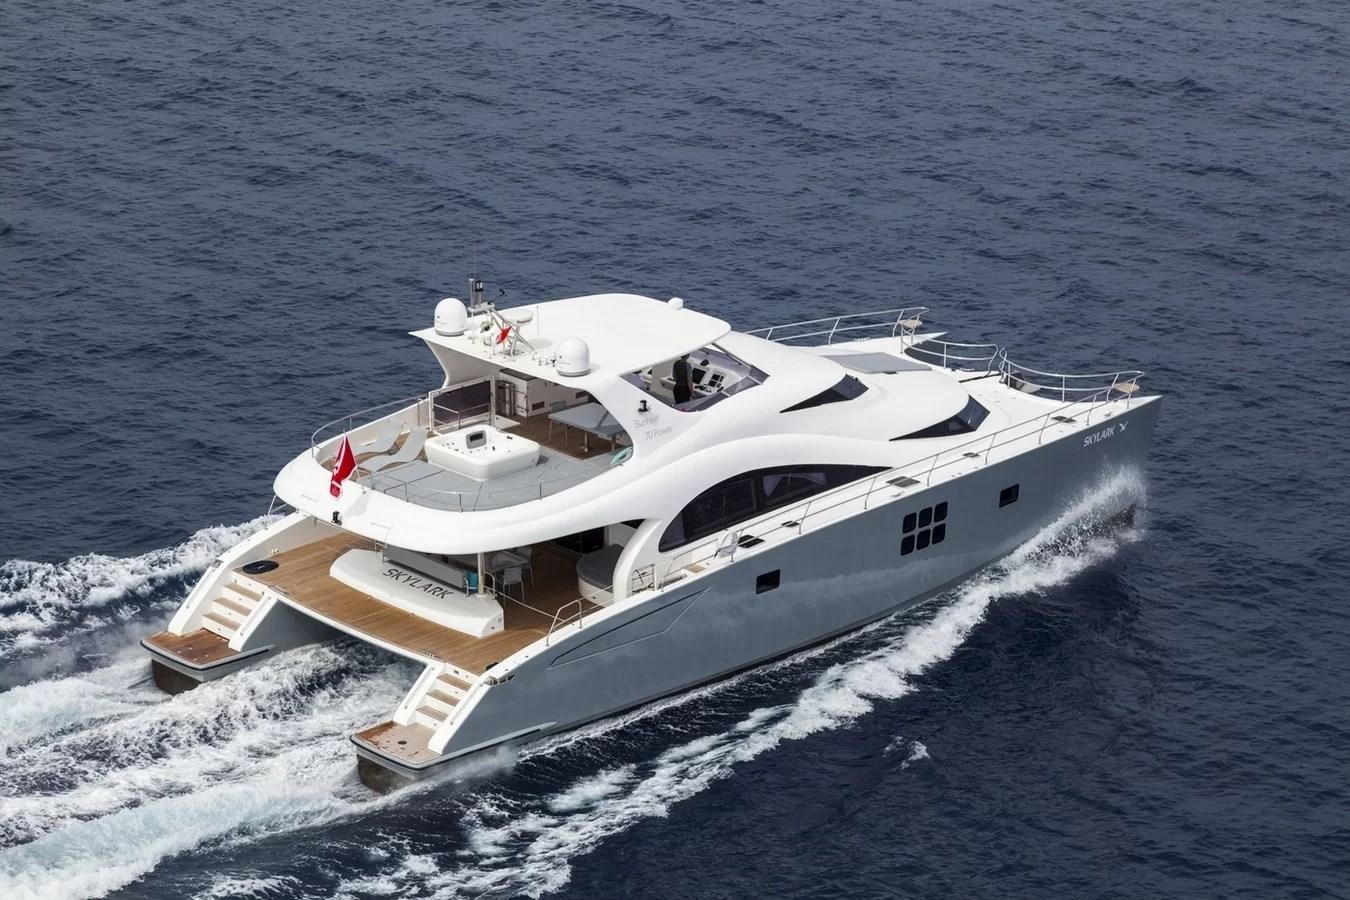 Bvi Power Catamaran Charter Services